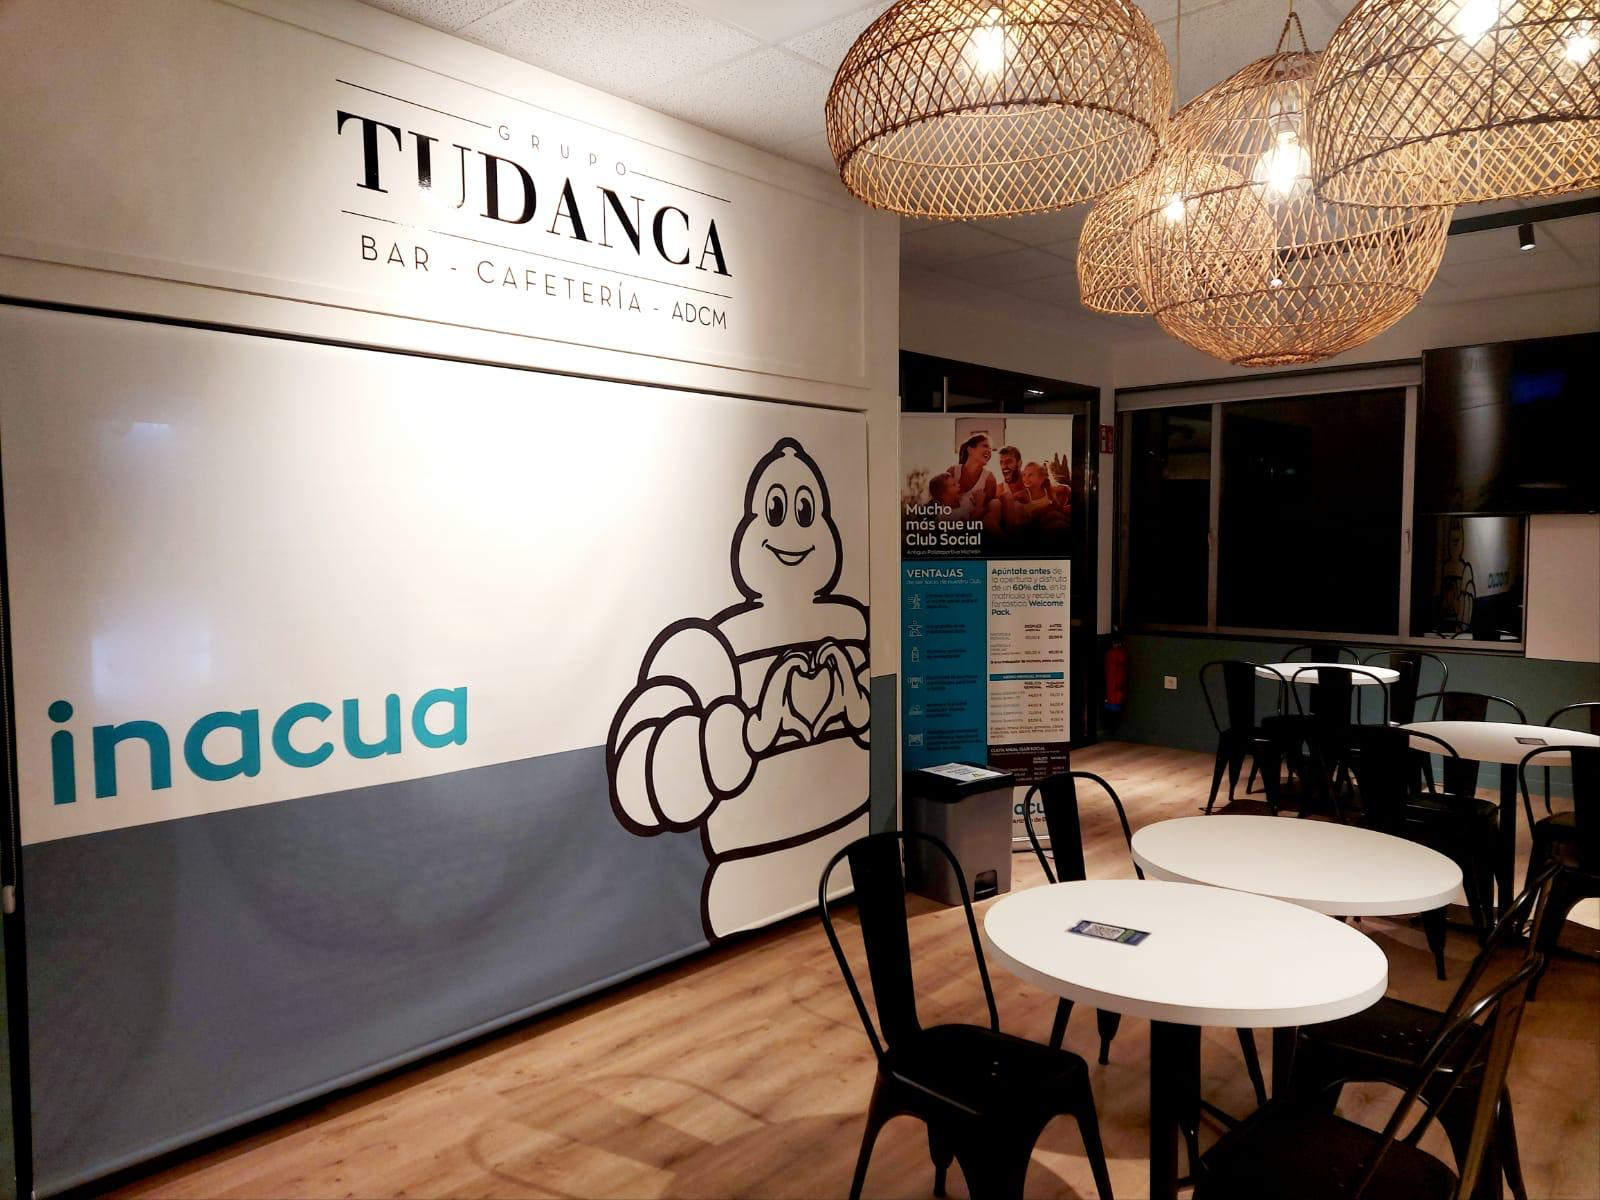 Bar Cafetería Tudanca INACUA ADCM